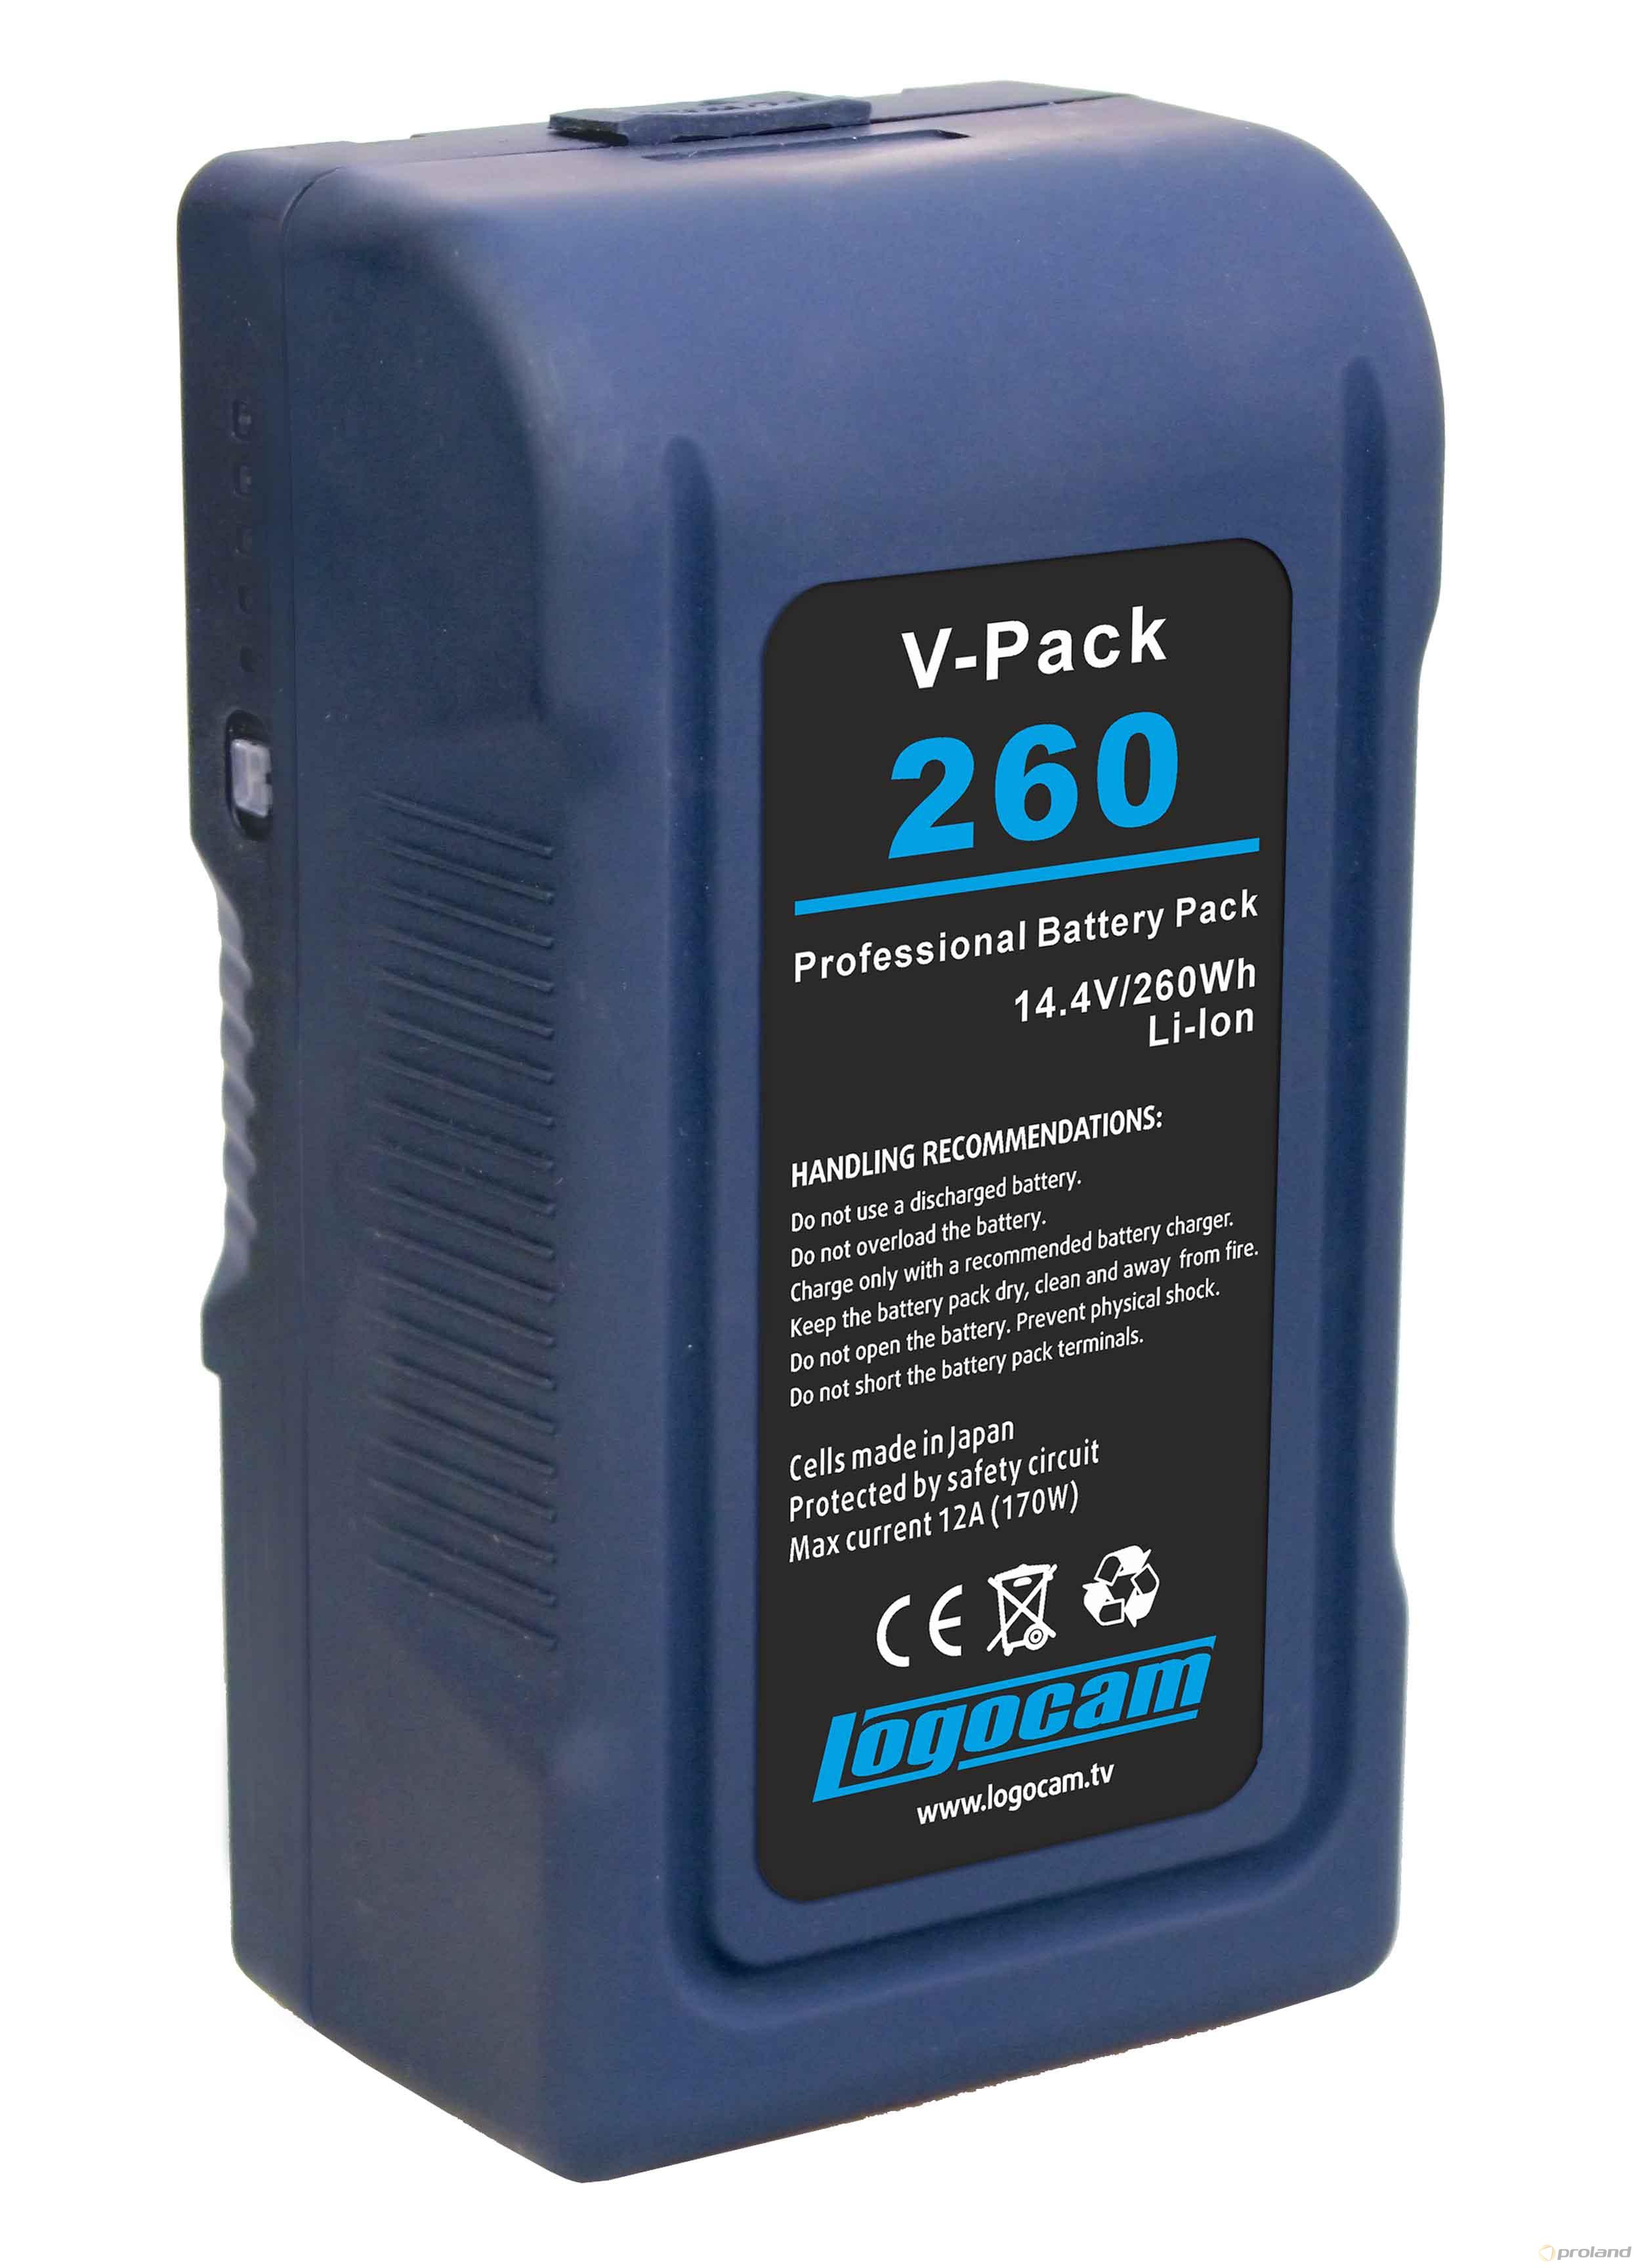 Logocam V-Pack 260